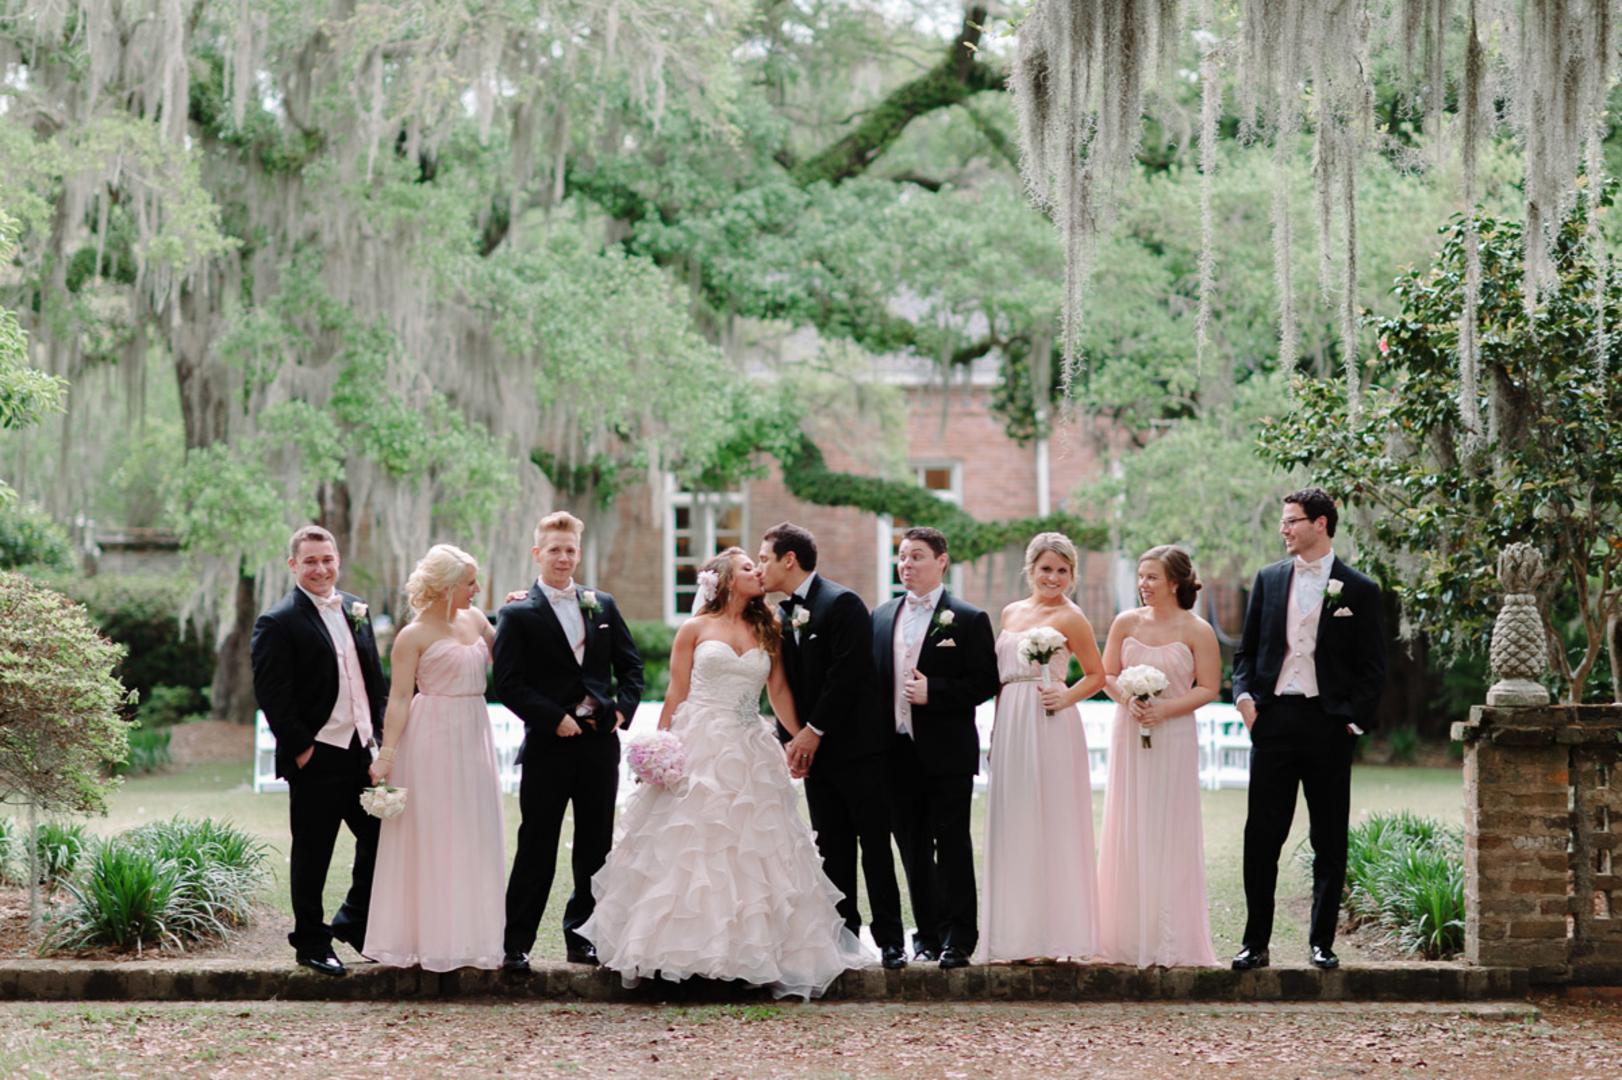 mansfield-plantation-wedding-1.jpg